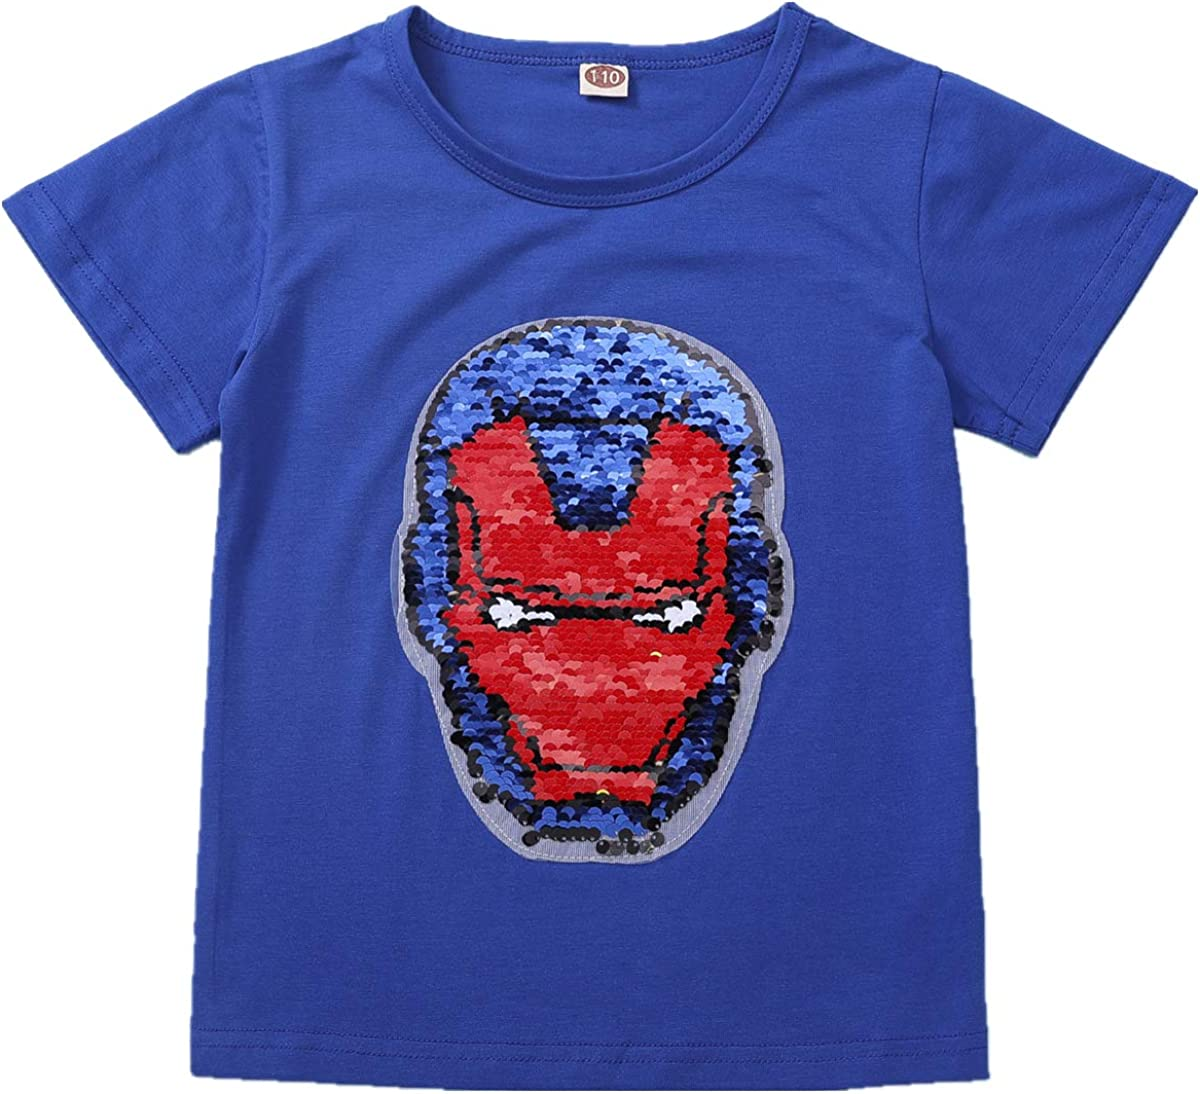 110-150 cm i pass Boy Girl Superhero T-Shirt Reversible Sequins Magic Cotton T-Shirt 3-8 Years